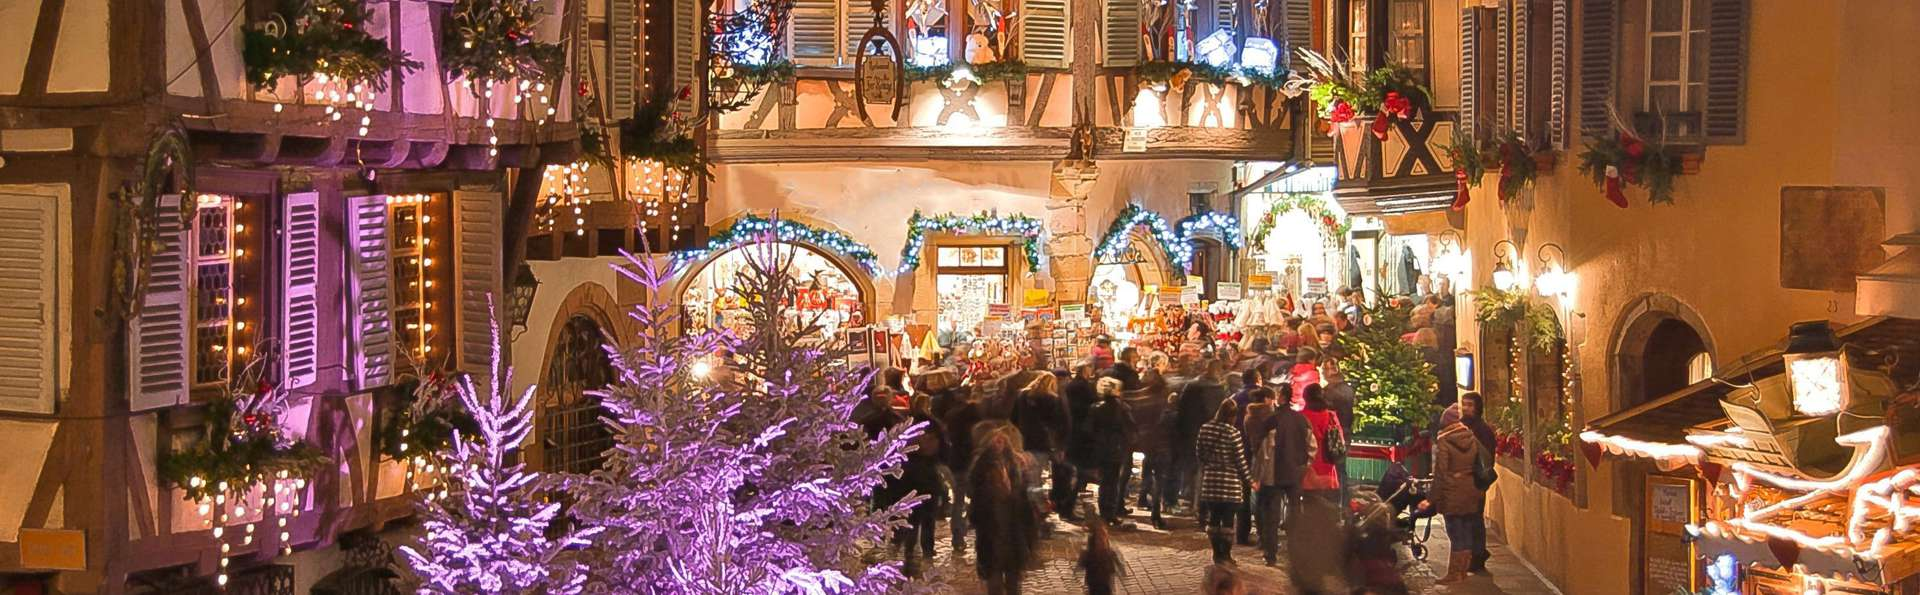 Leukste Kerstmarkten Weekend Niederbronn Les Bains Met Gastronomisch